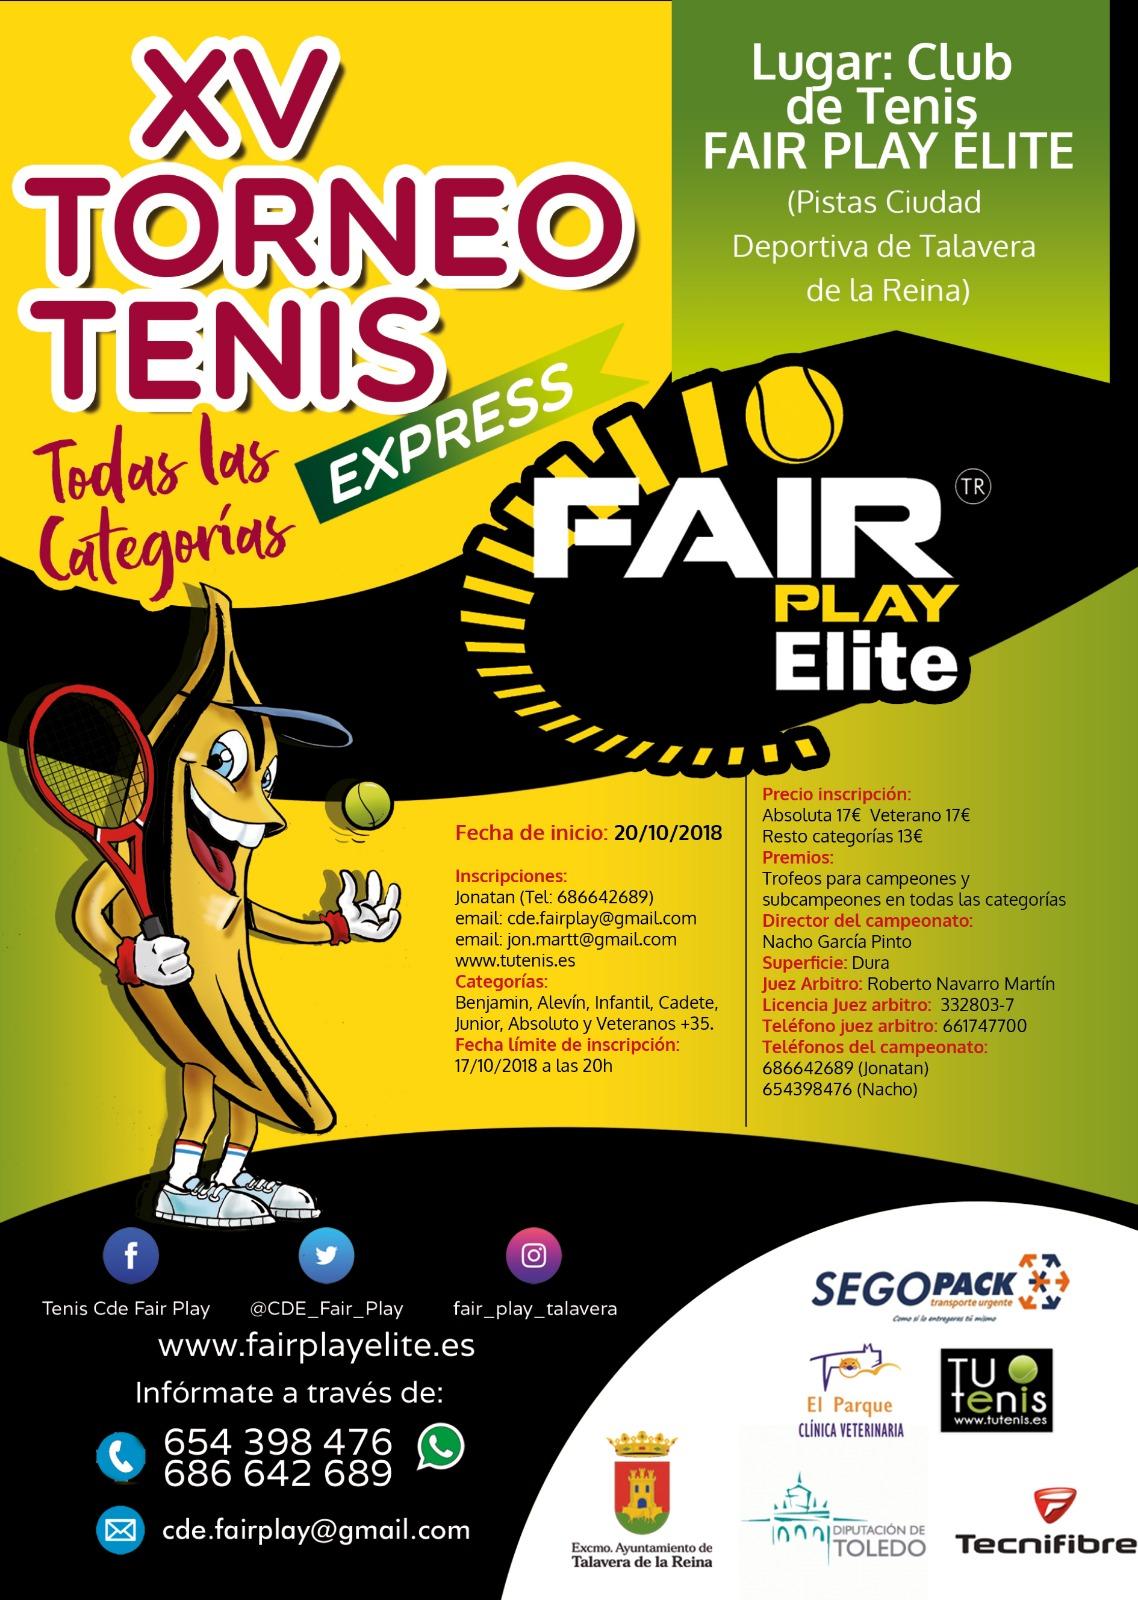 torneo_fair_play_elite_express